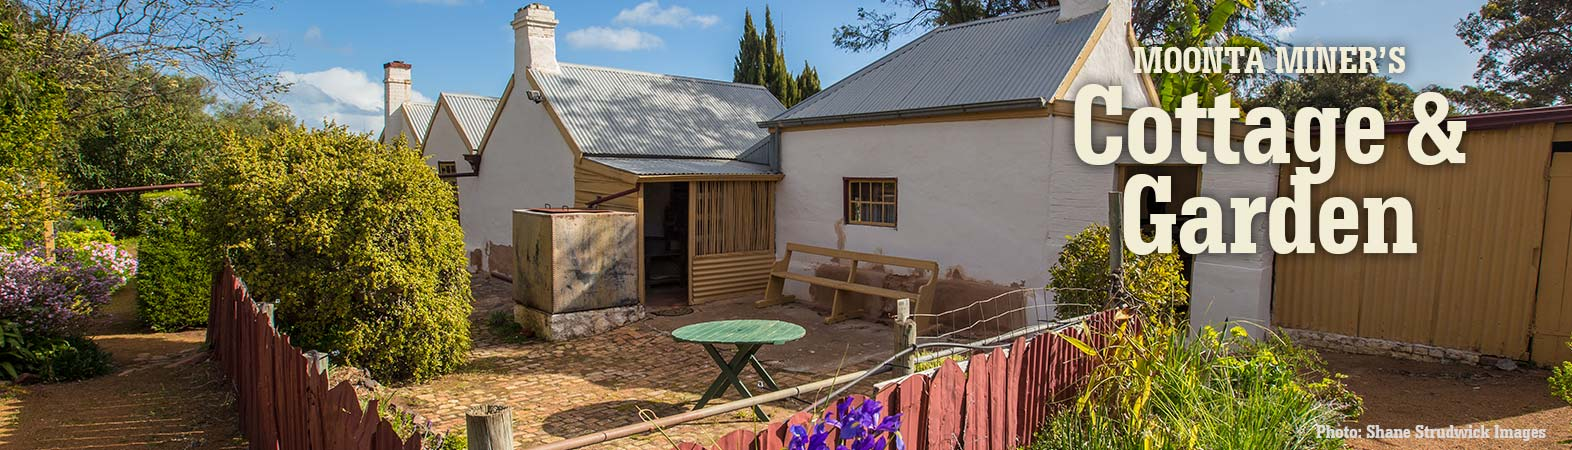 Moonta Miner's Cottage and Garden Banner Shane Strudwick Images